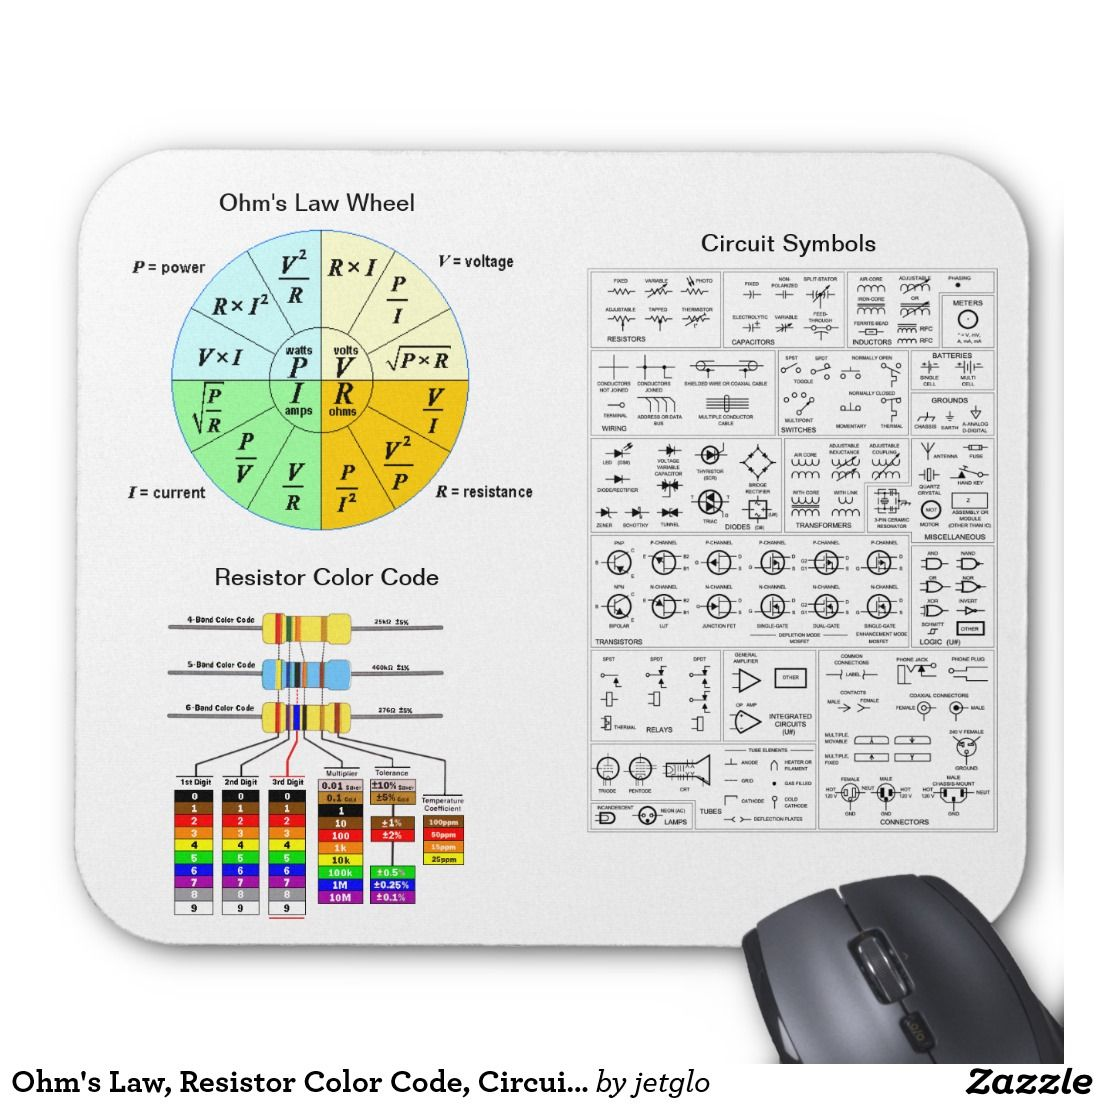 Ohms Law Resistor Color Code Circuit Symbols Mouse Pad A Matics Electronics Electronic